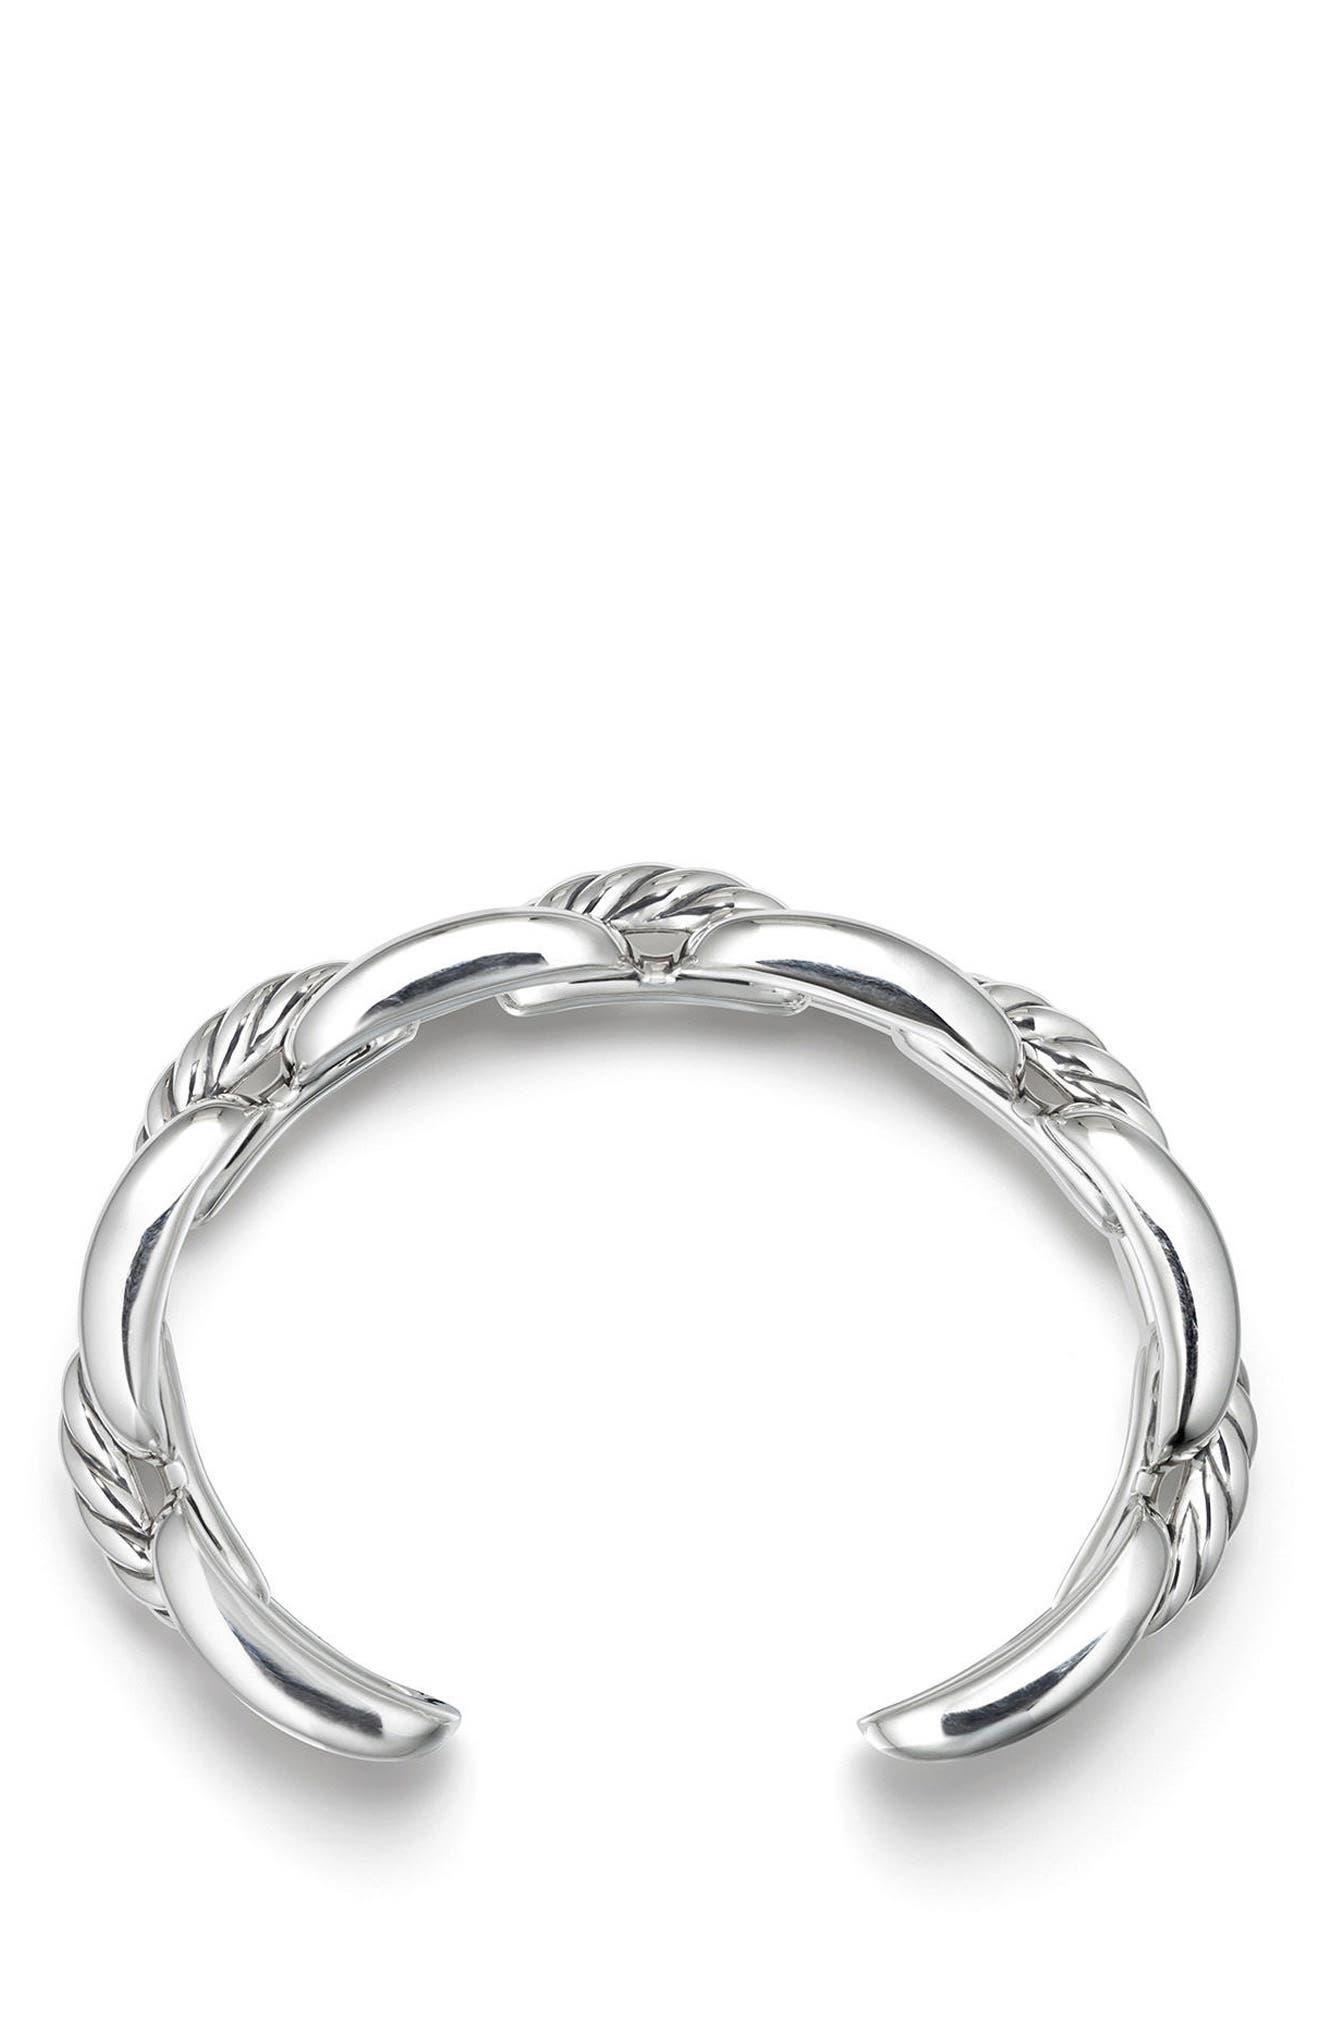 Alternate Image 1 Selected - David Yurman Wellesley Chain Link Cuff Bracelet